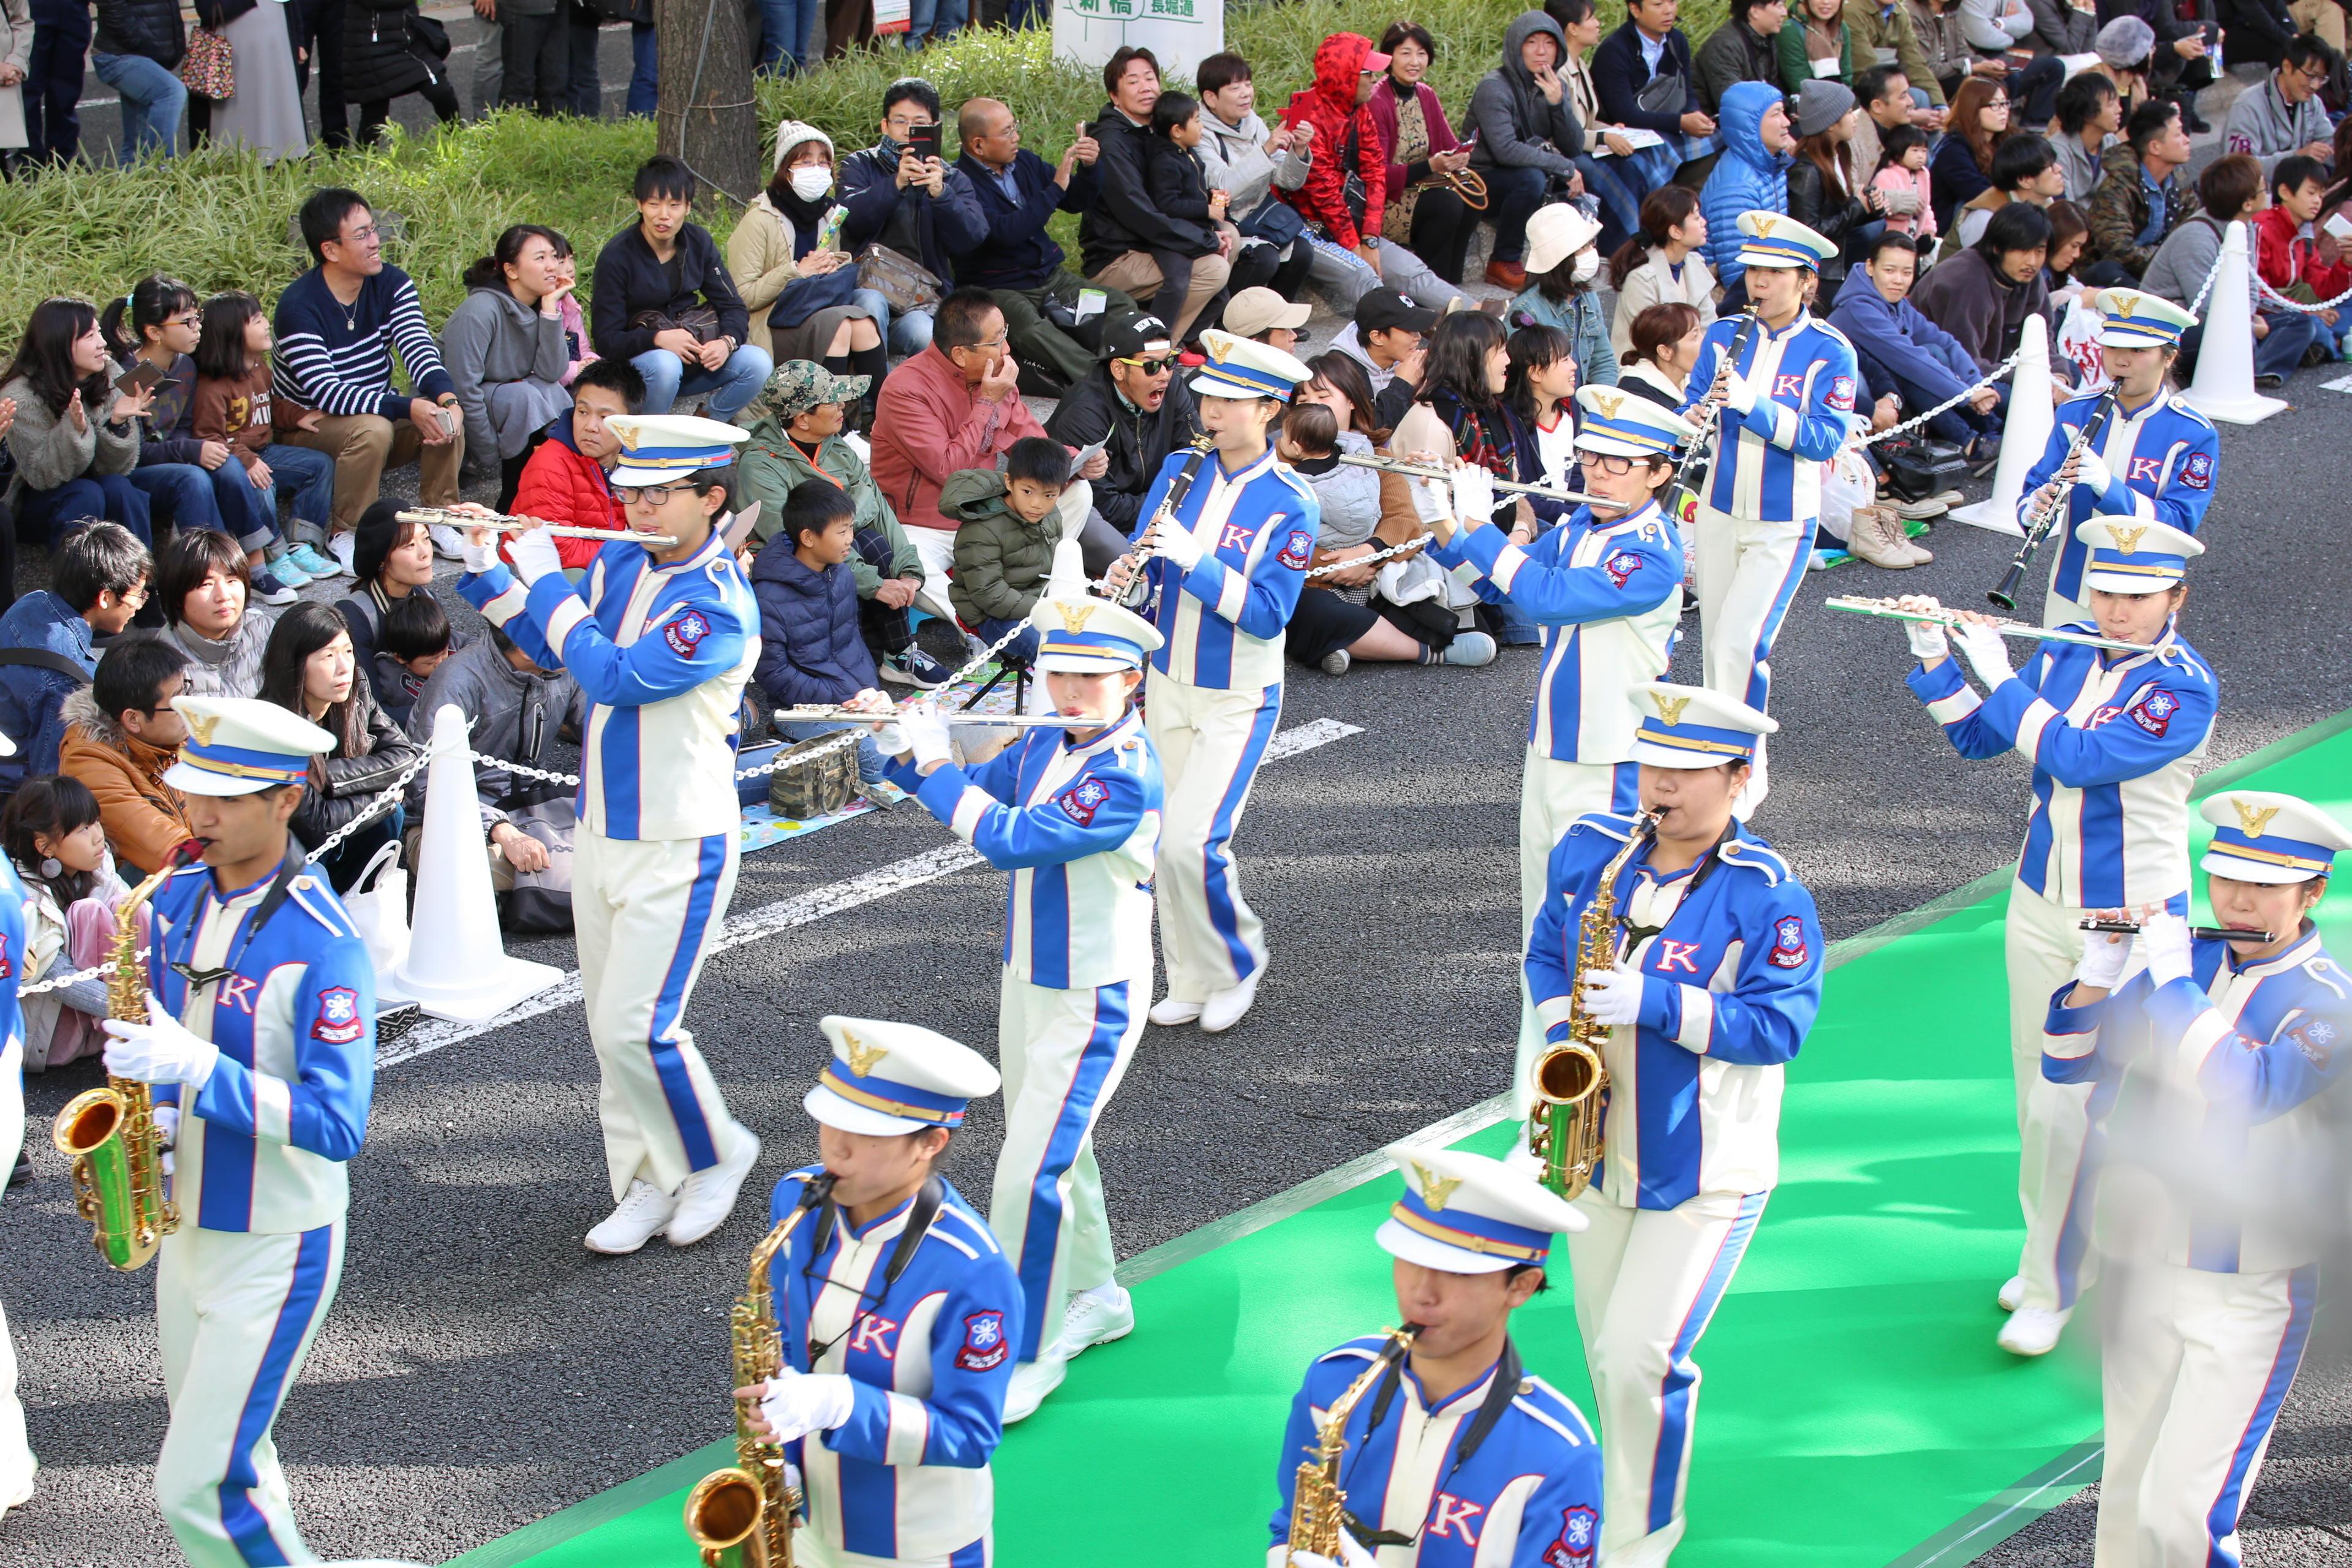 http://news.yoshimoto.co.jp/20171112221829-0ba8271023e8f84153e065caf8edcf2438b8a8ad.jpg